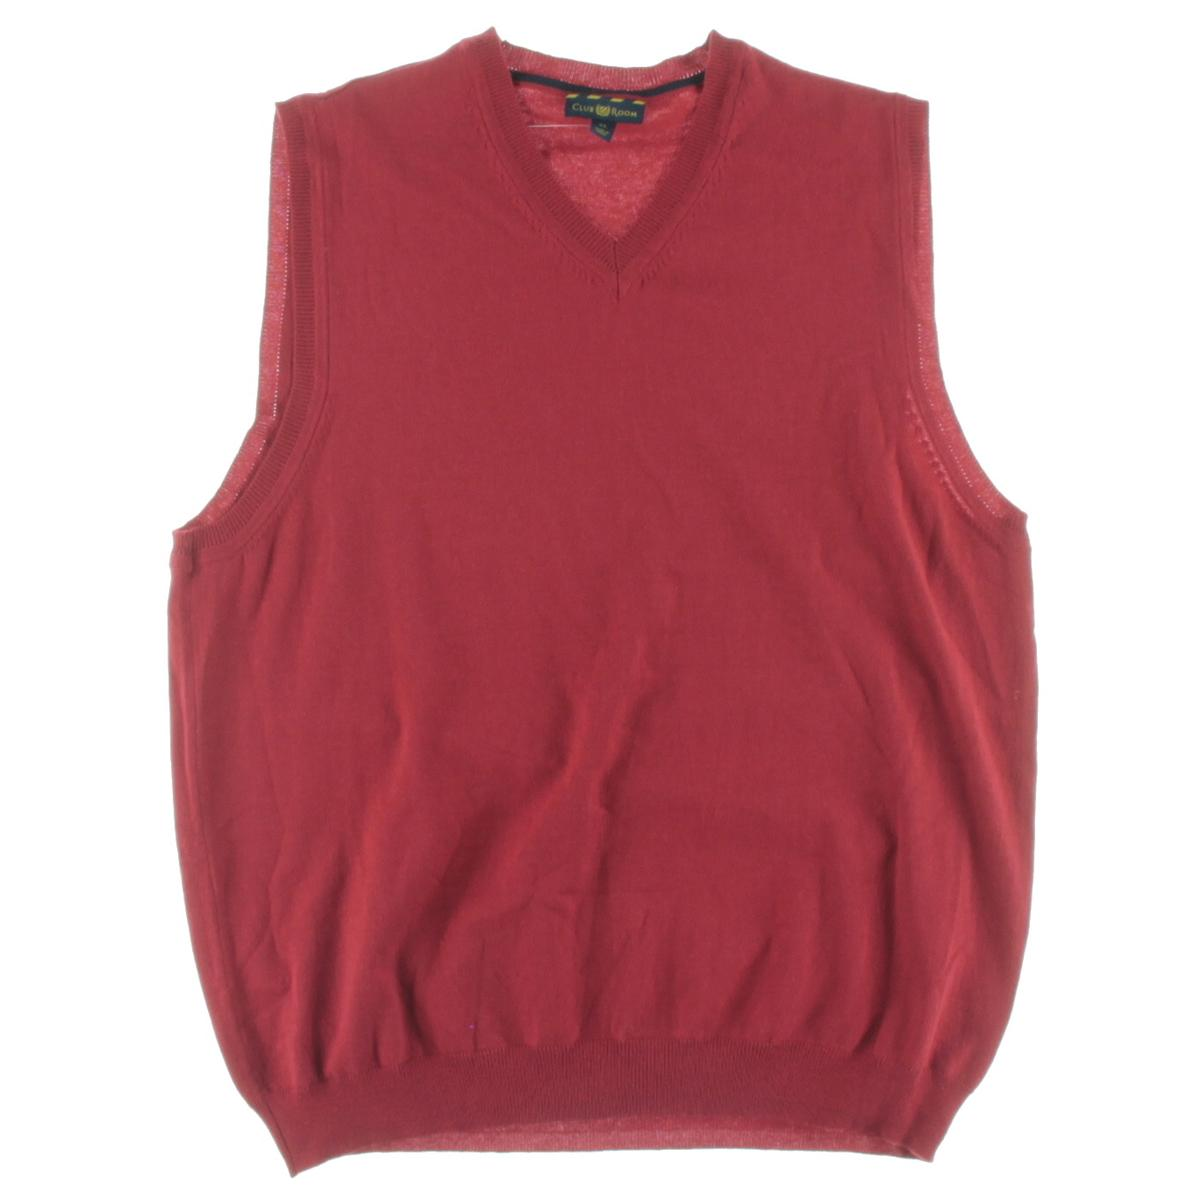 Club Room 9631 Mens Solid V Neck Sweater Vest BHFO | eBay